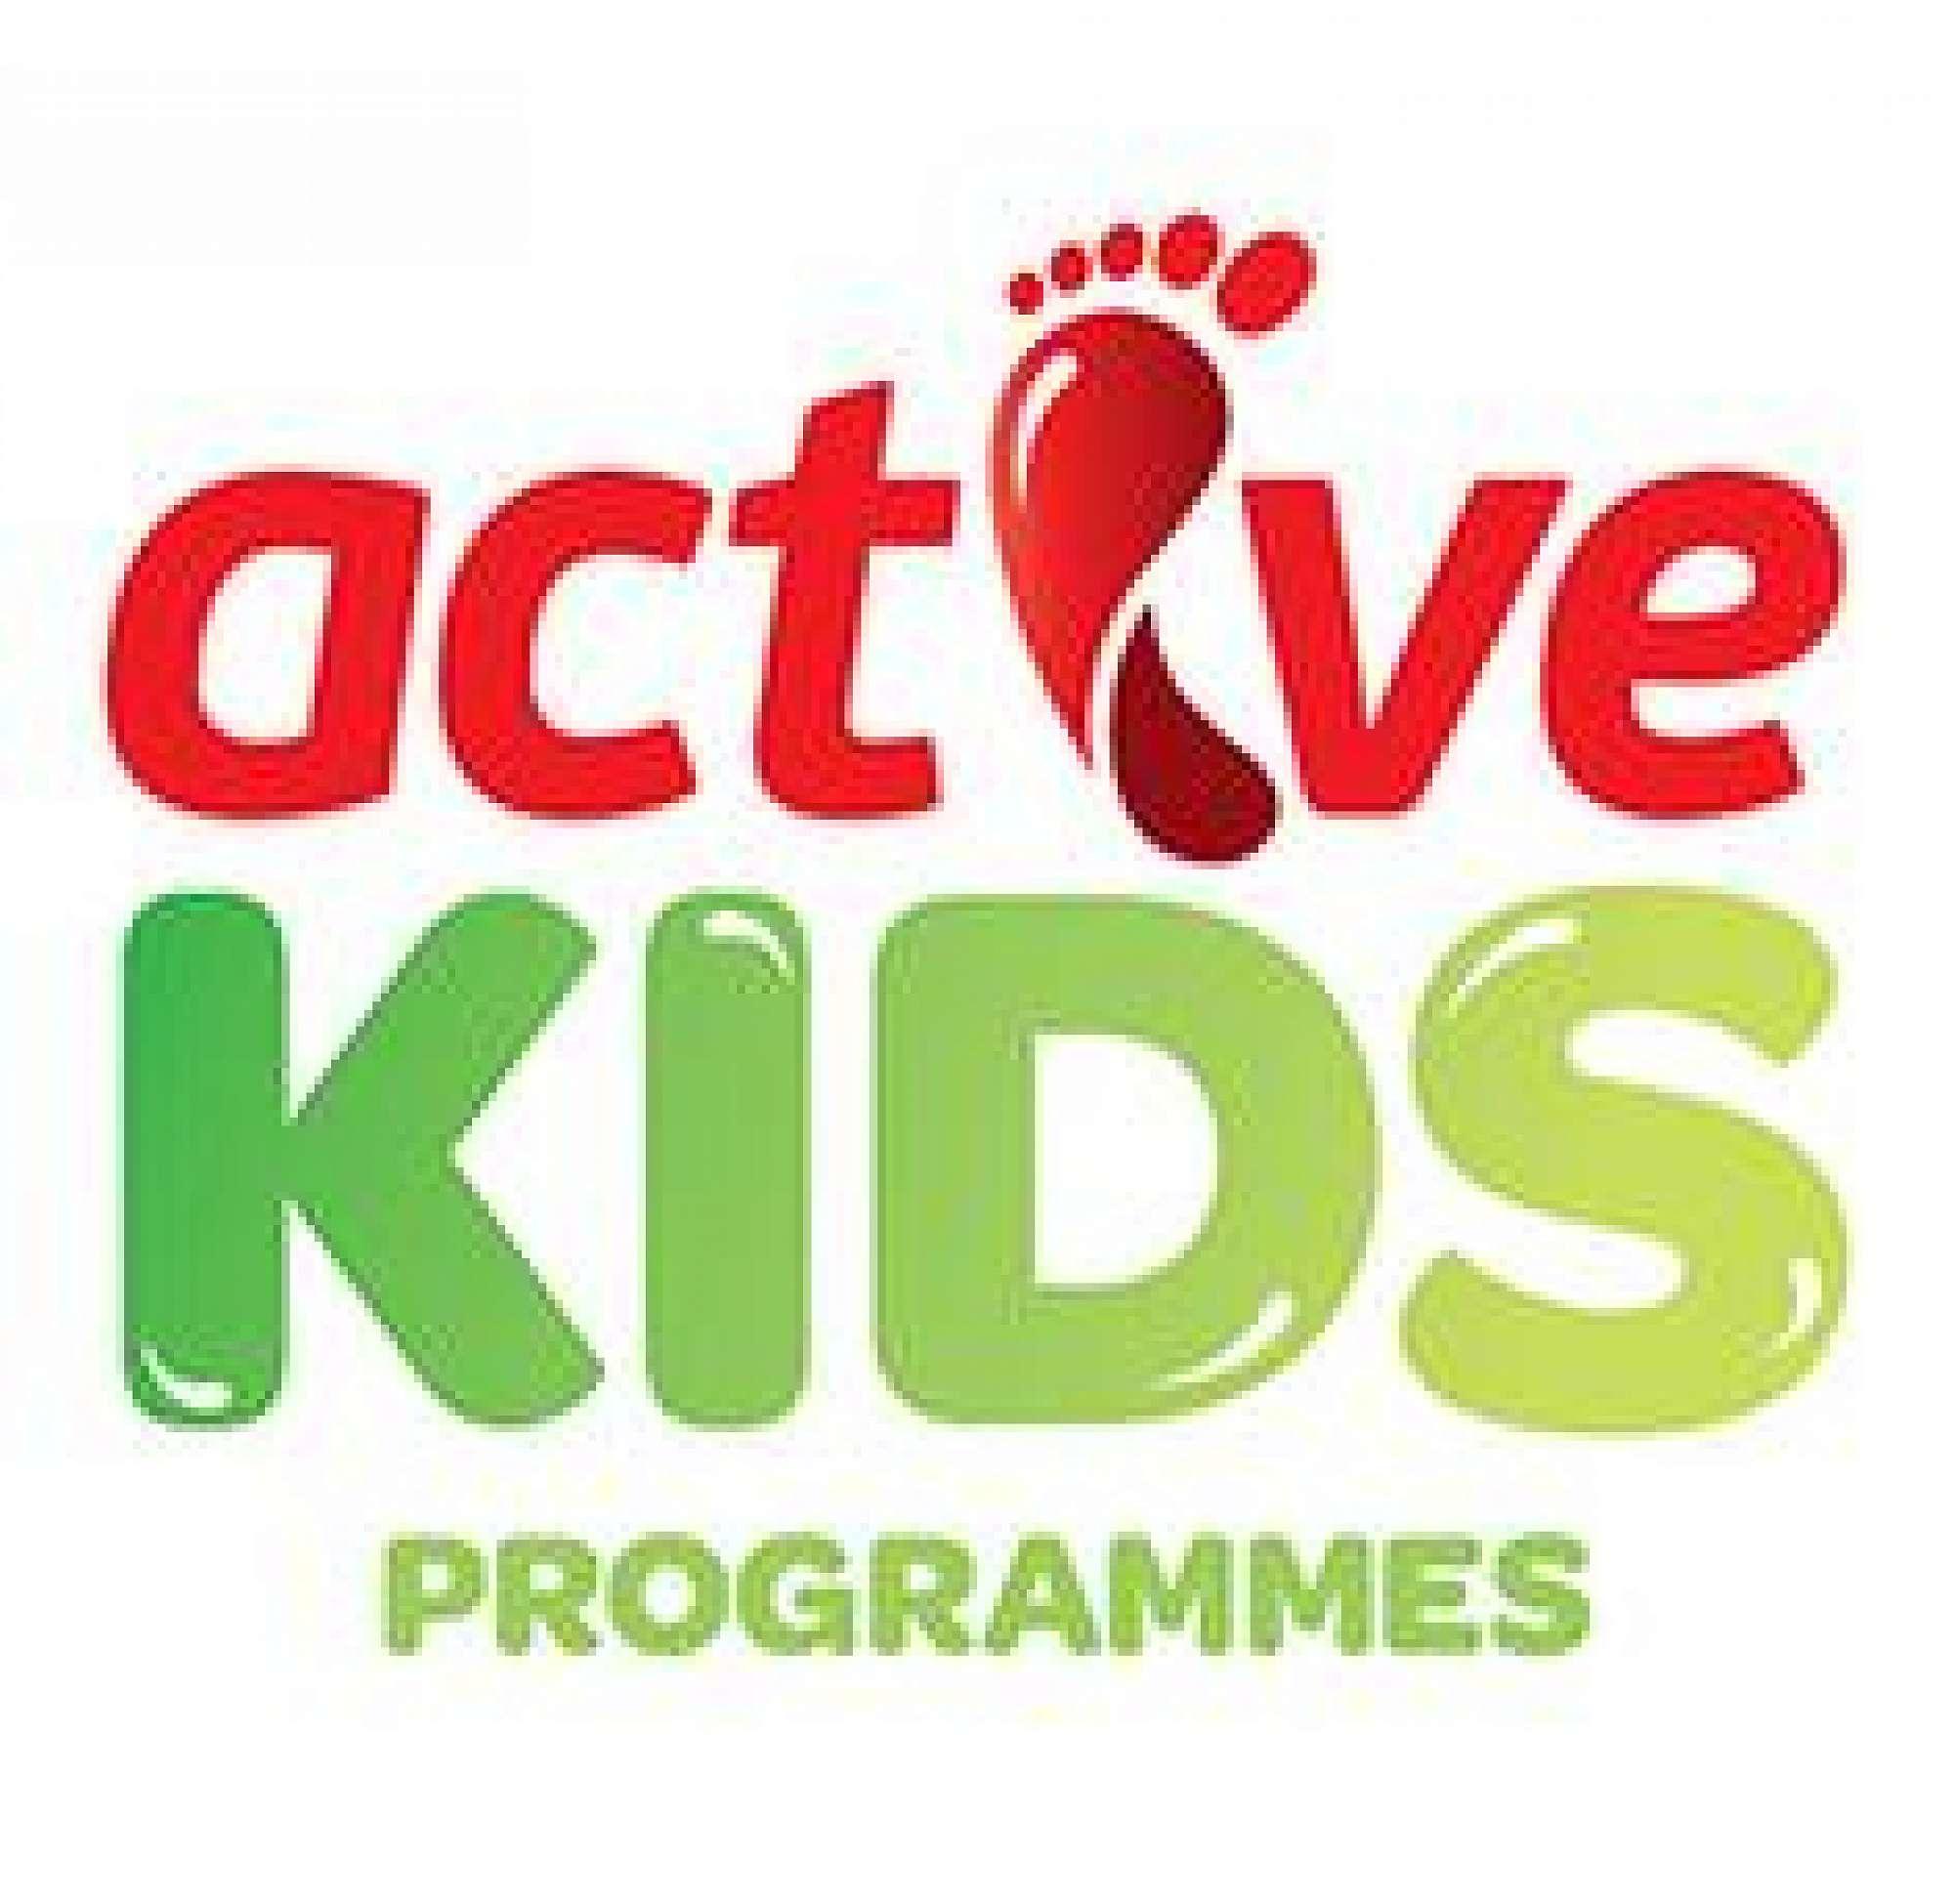 Sports Canterbury Holiday Programme